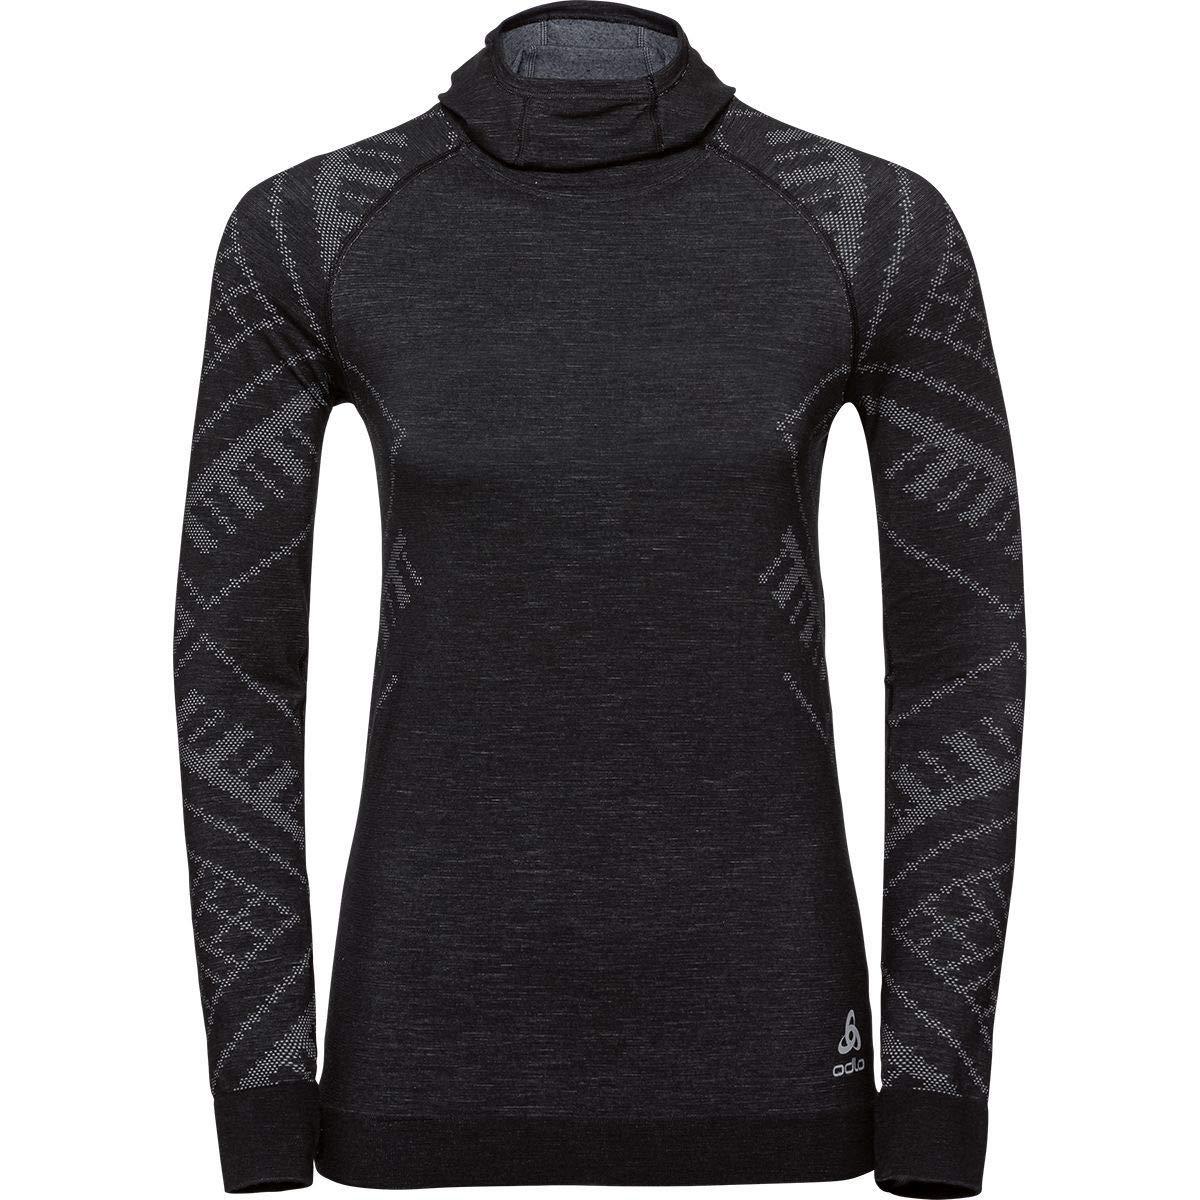 Kinship Warm Shirt ODLO Womens Suw Top with Facemask L//S Natural Womens 110701